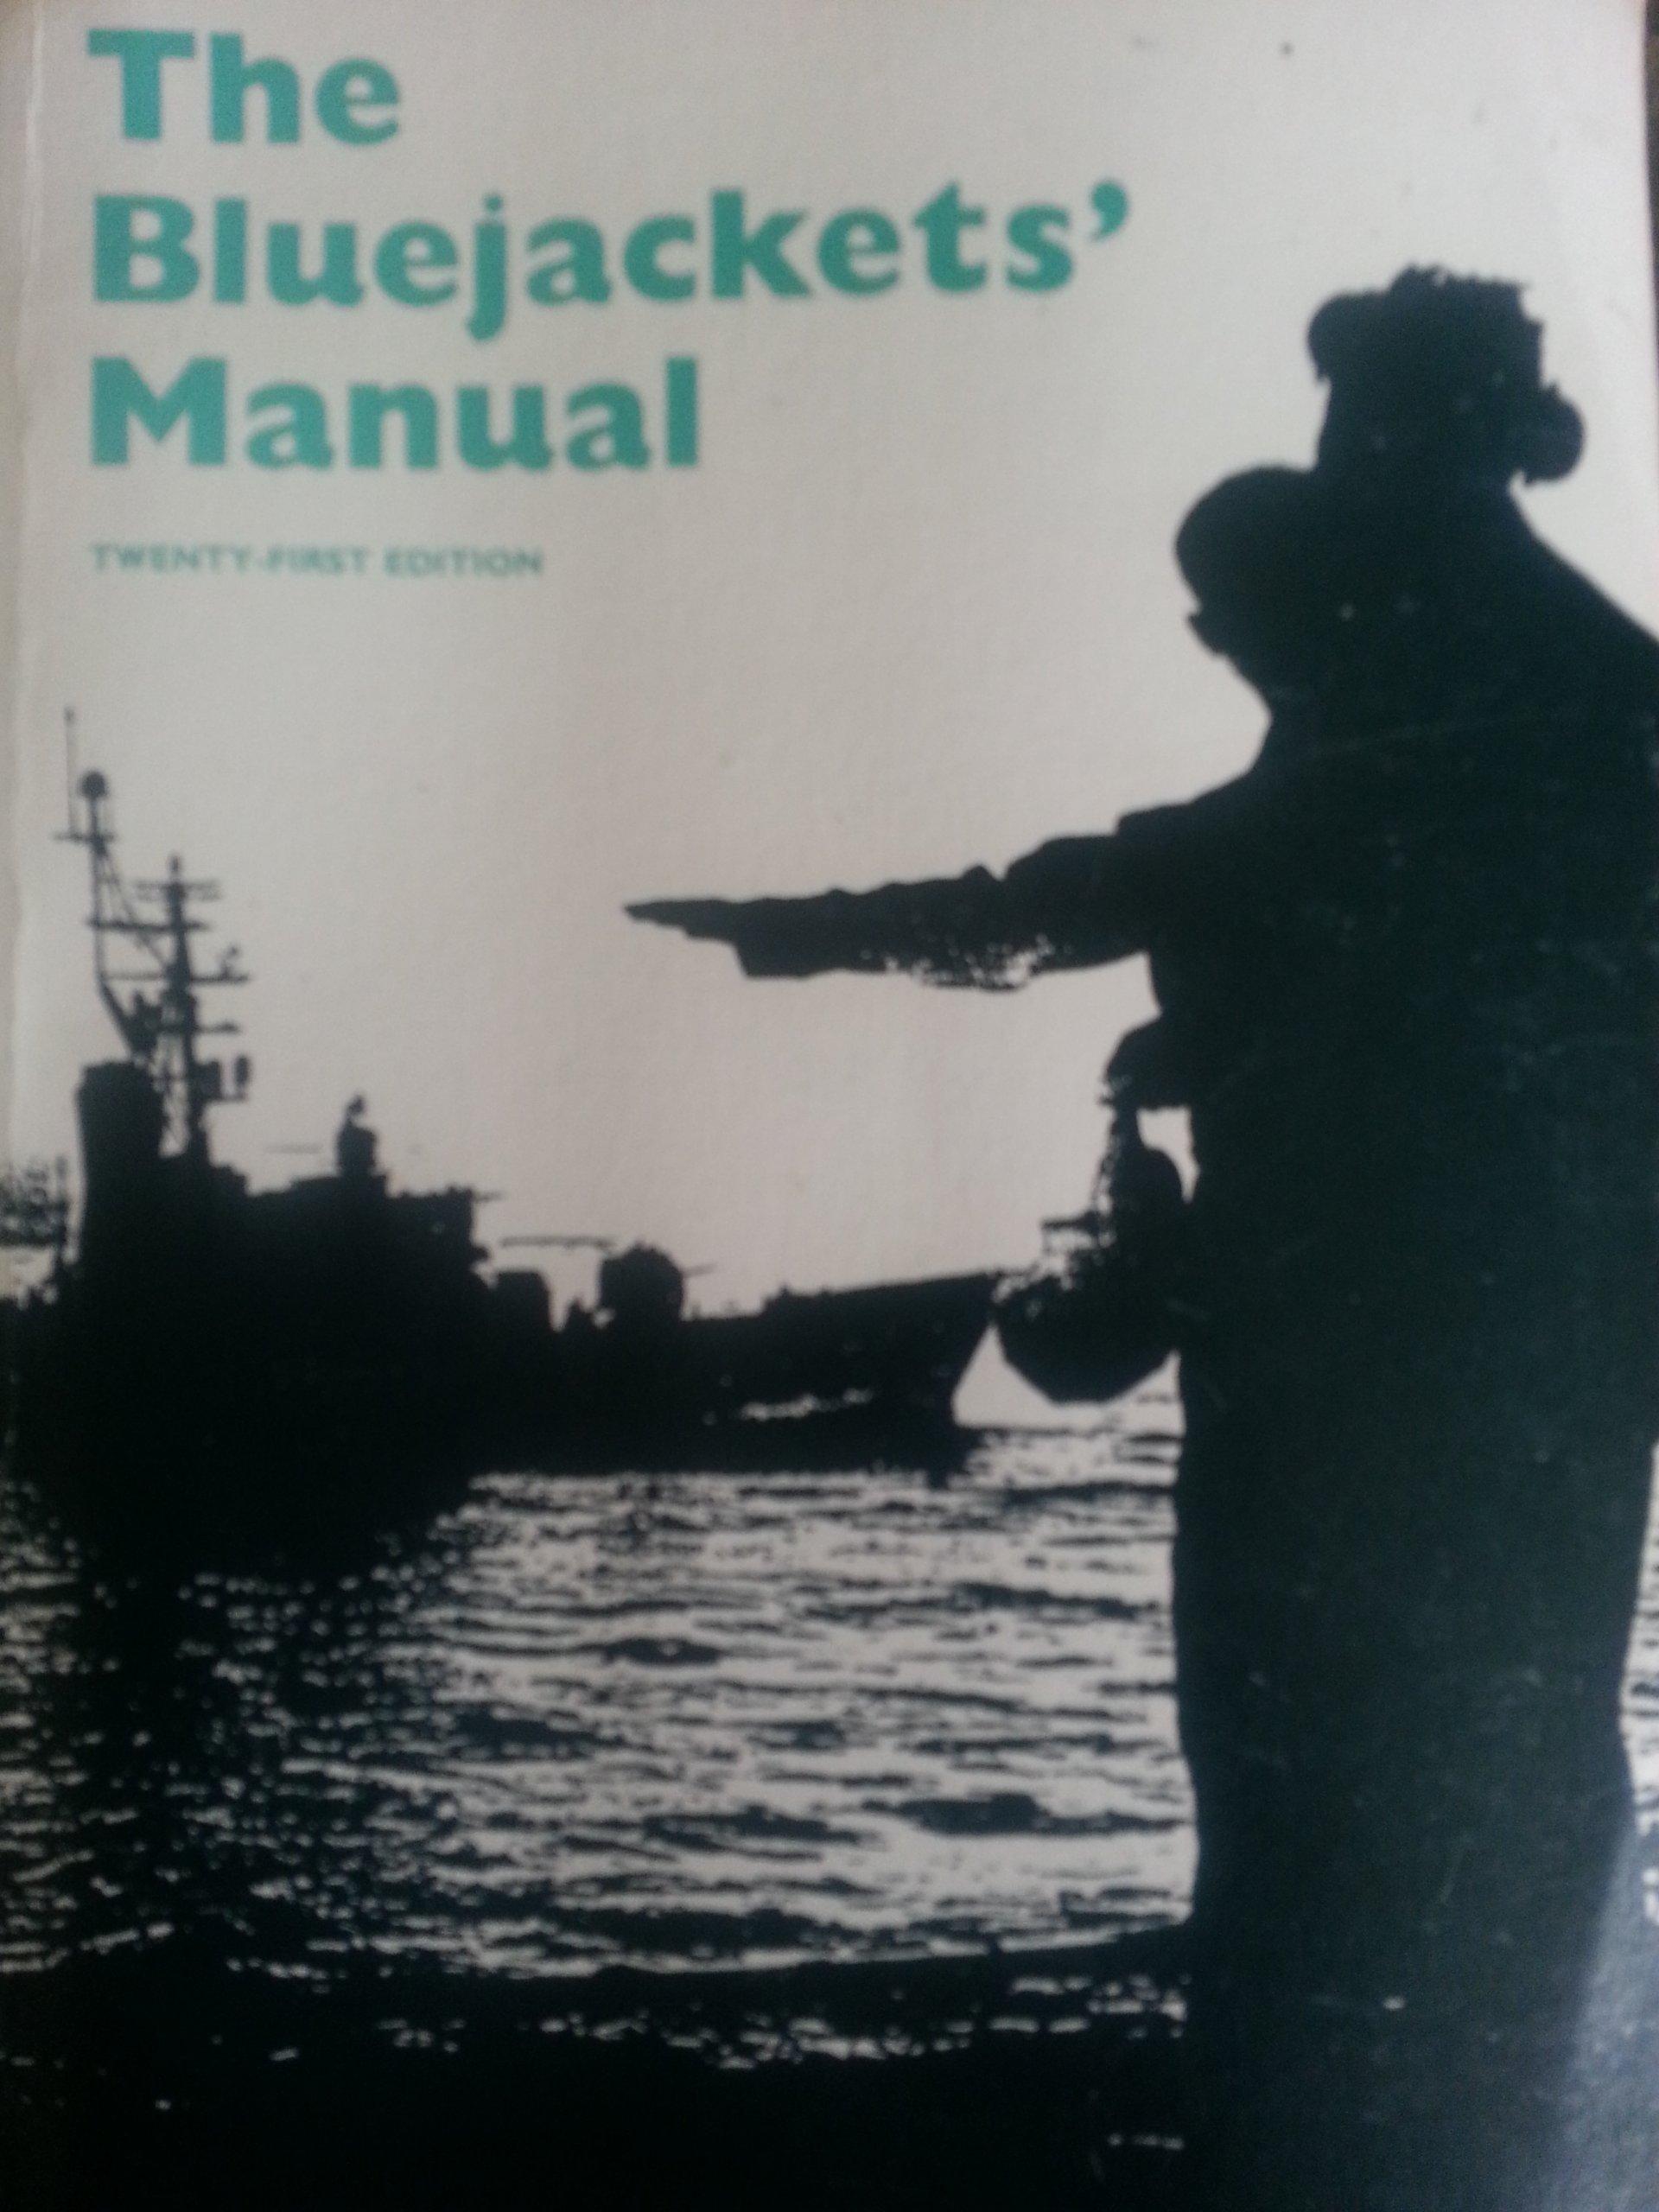 The Bluejackets' Manual: B. Beardon: 9781557500502: Amazon.com: Books